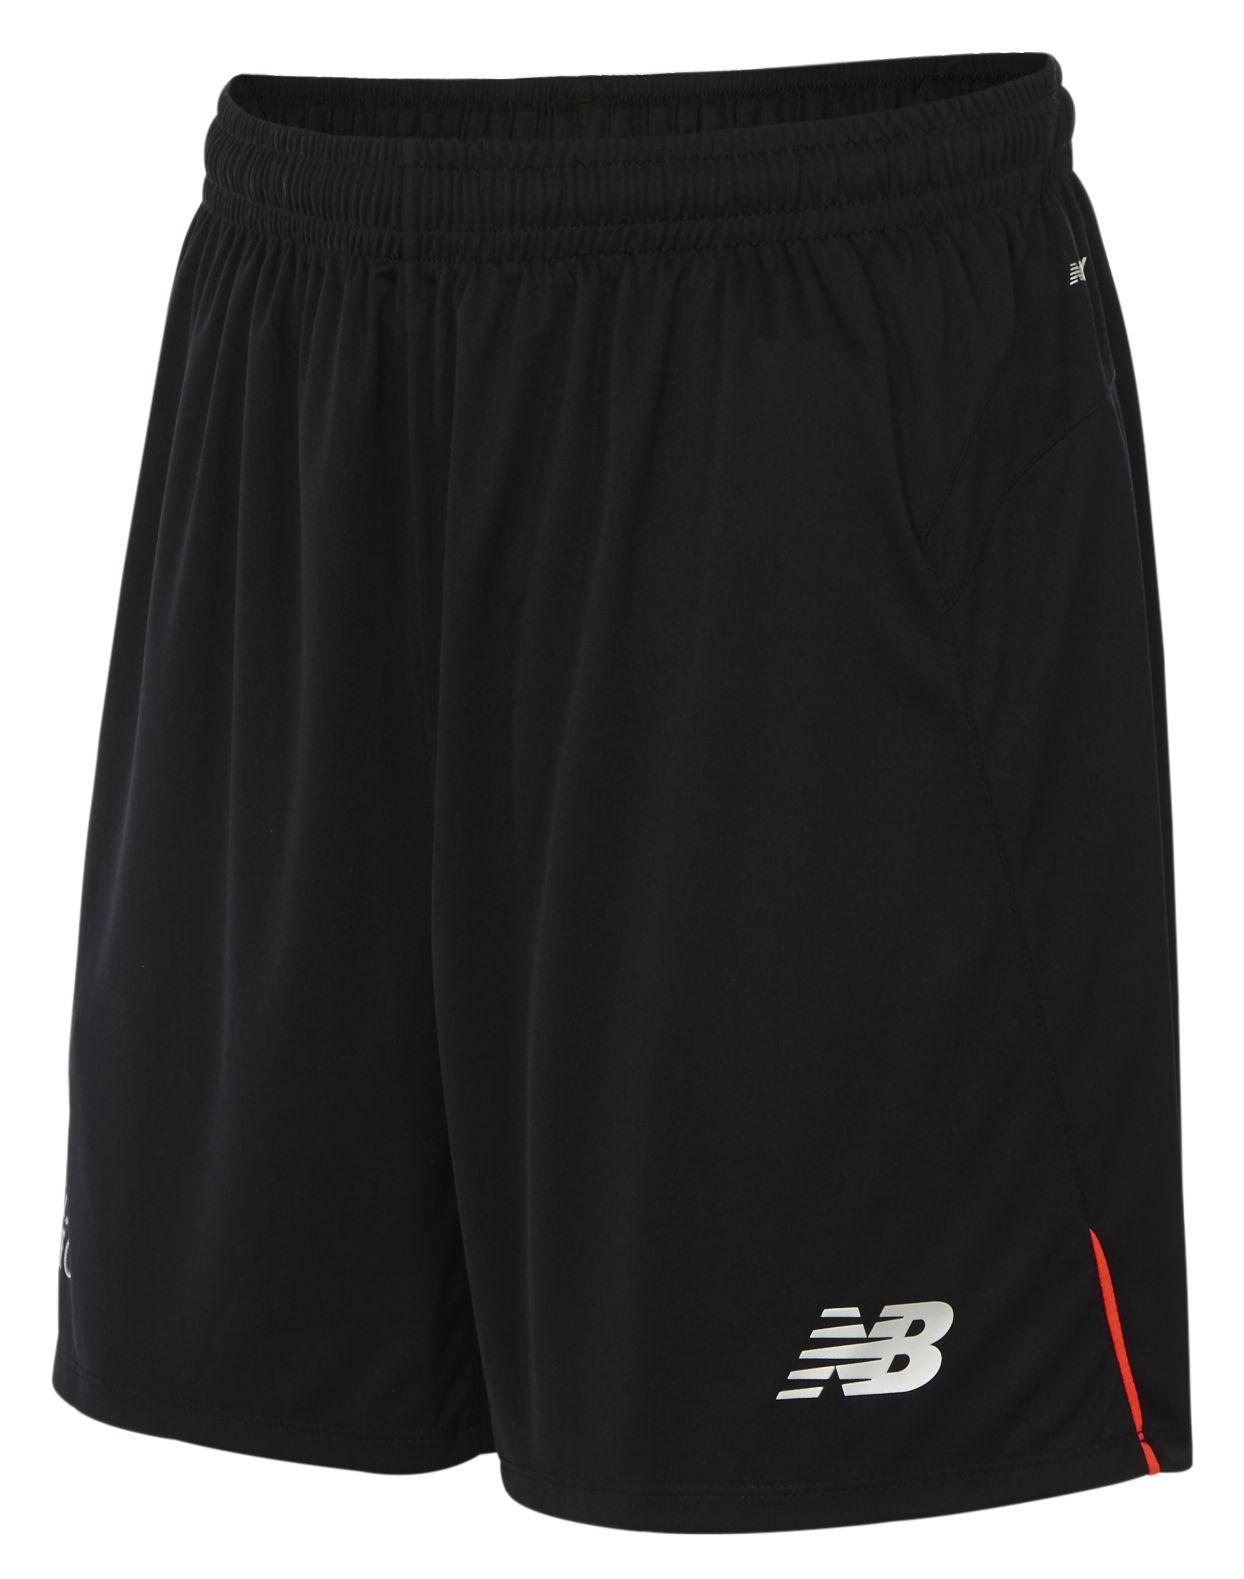 New Balance : LFC Mens Away Knitted Short : Men's 2016/17 Away Kit : MS630003BK